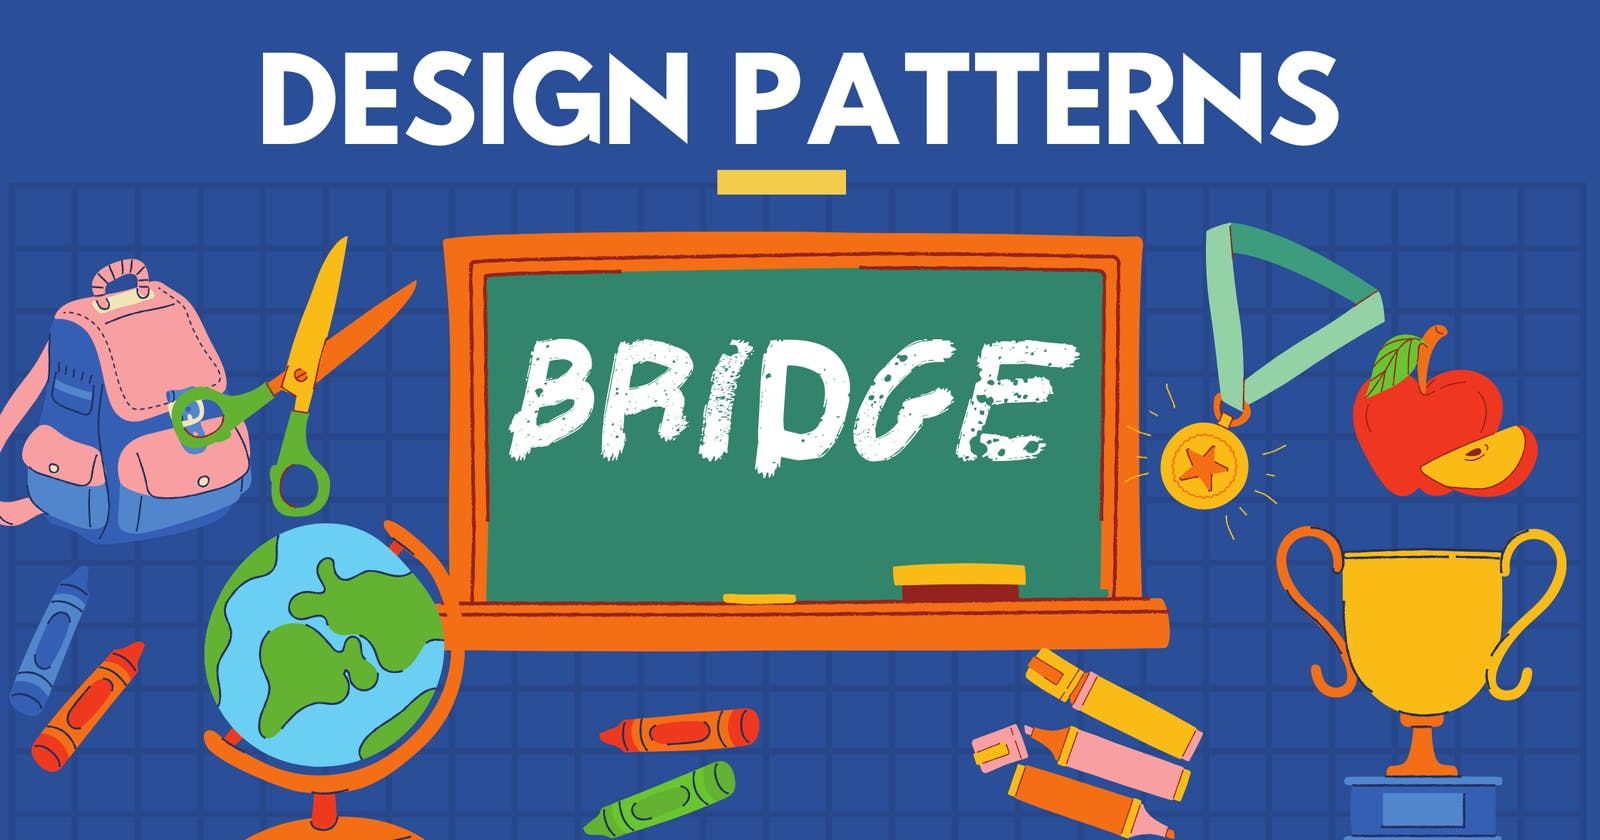 Design Patterns - Bridge